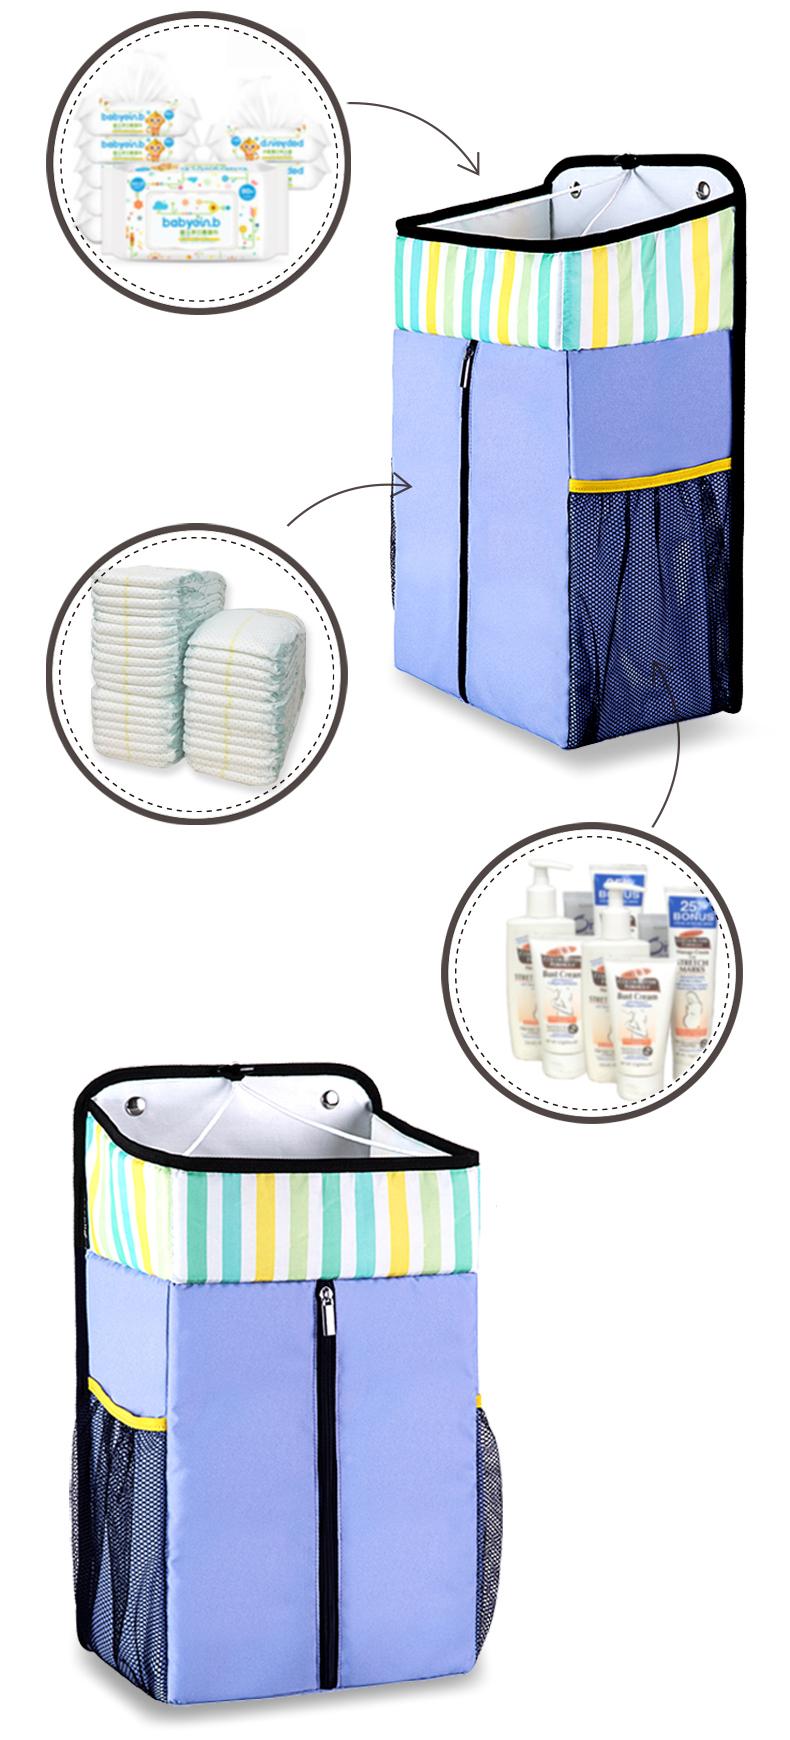 Daballa-Trixx-Baby-Crib-Organizer-Newborn-Playpen-Bed-Crib-Cot-Bedding-Set-Accessories-Toys-Stacker-Nursery-Caddy-for-Baby-Stuff-06